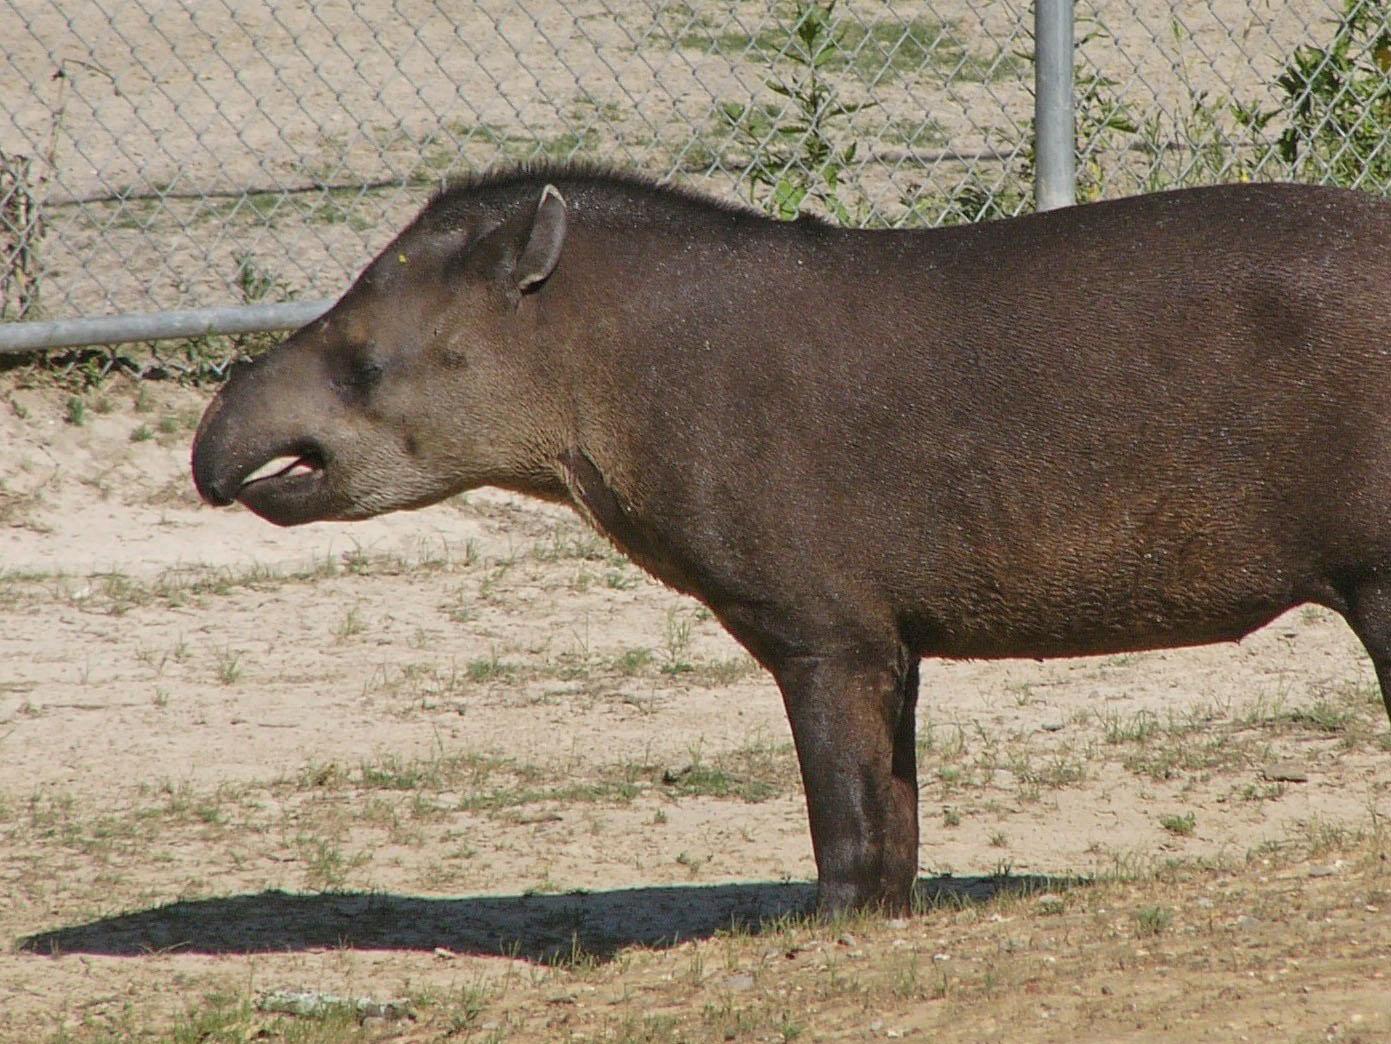 The Online Zoo Lowland Tapir